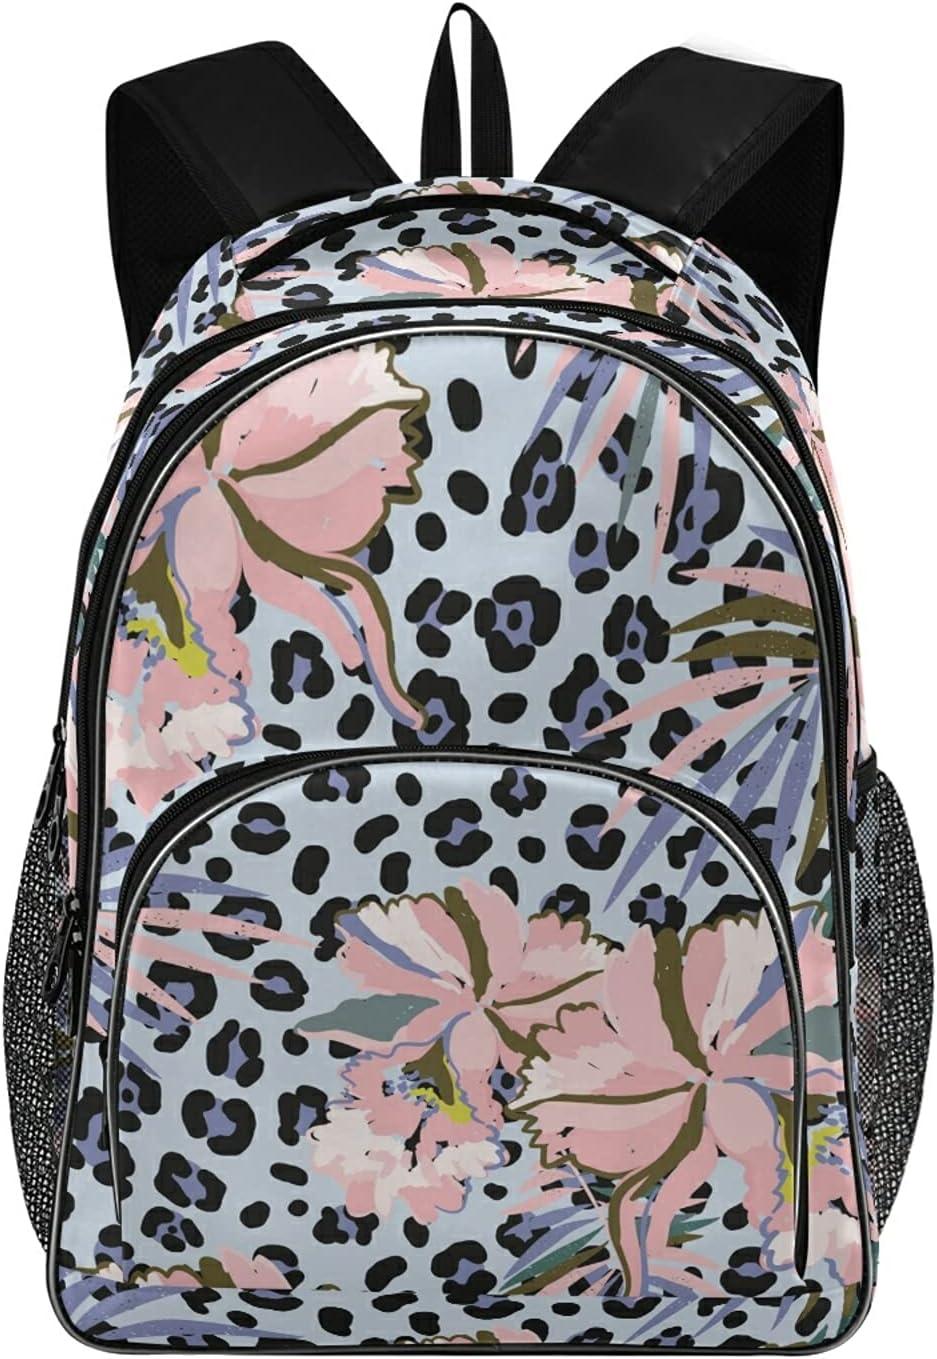 School Backpack Bookbag Laptop Fort Worth Mall Daypack men B Schoolbag for Ranking TOP12 Teens